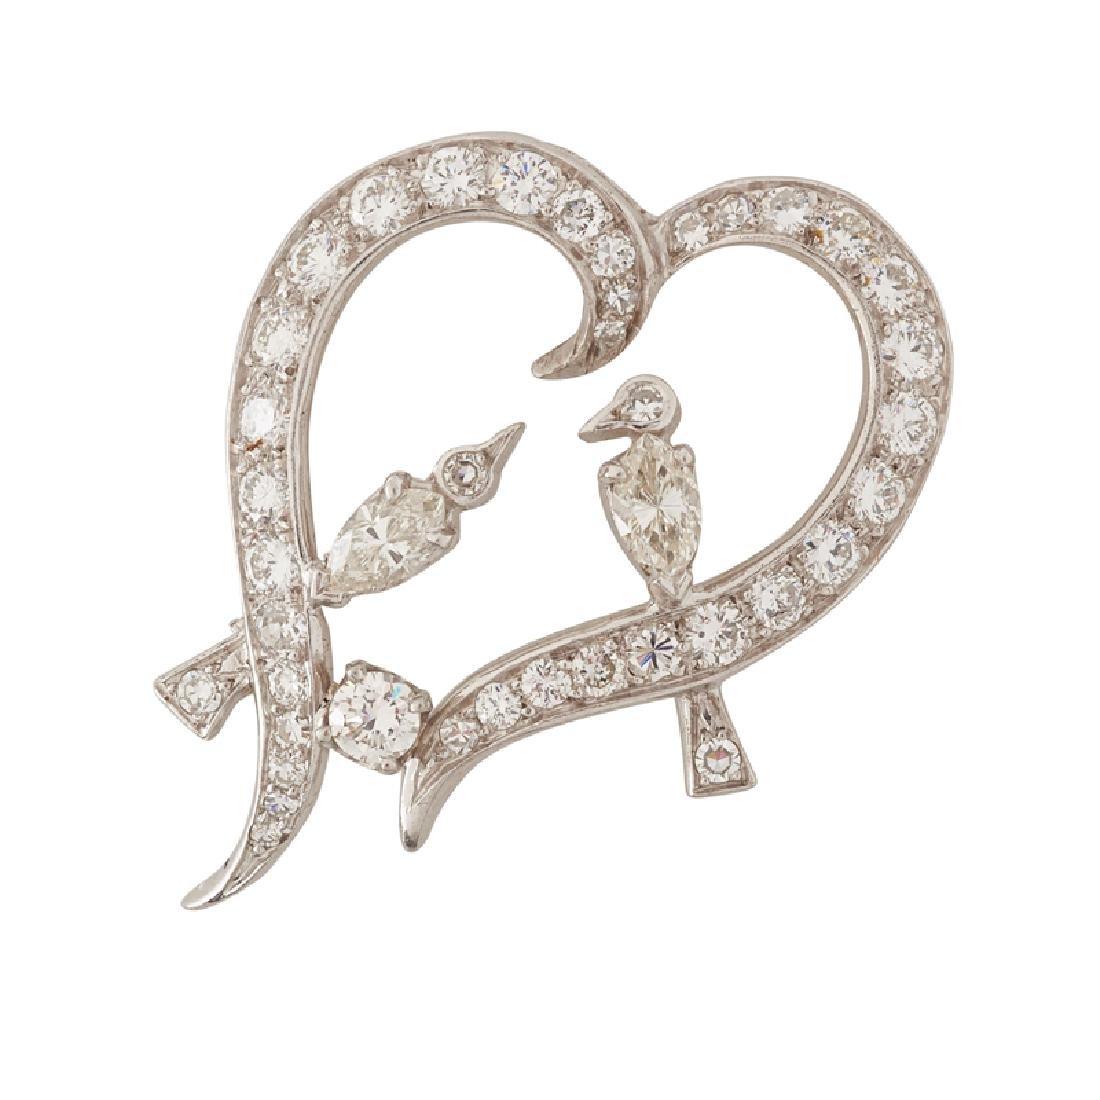 DIAMOND & PLATINUM LOVE BIRDS BROOCH